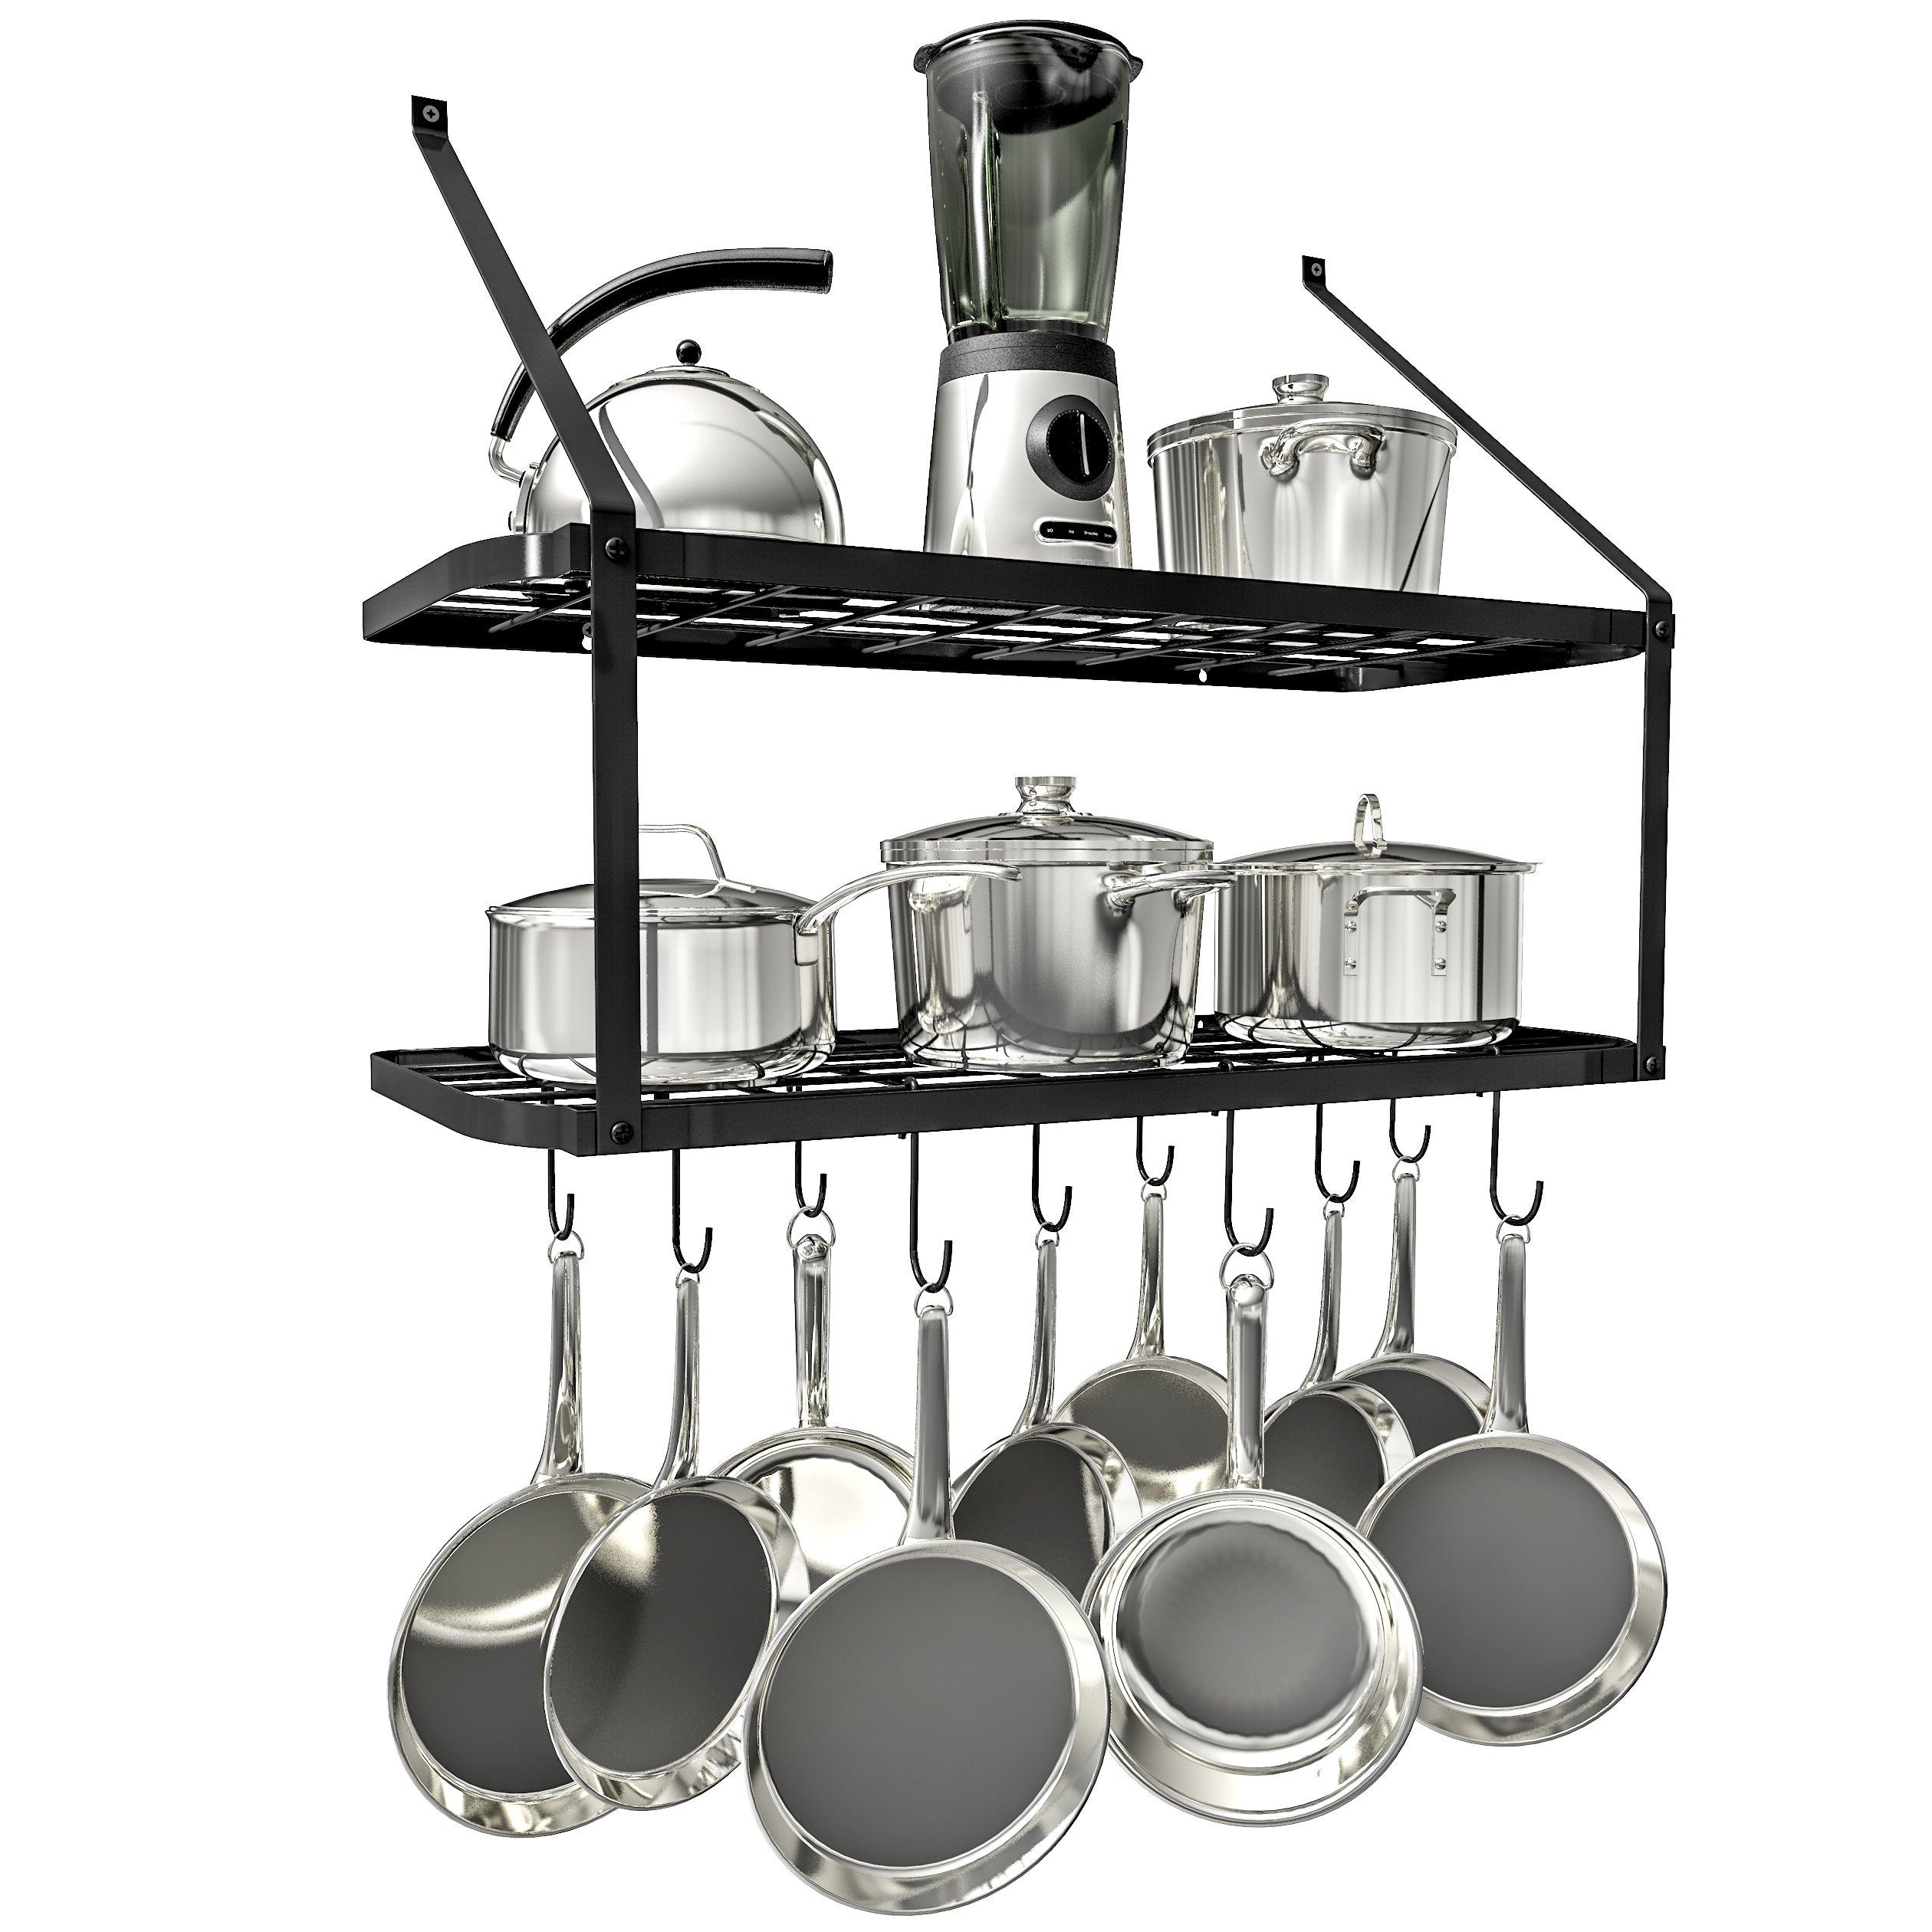 rack base bak table baker boos prep stainless s products john bakers bun x pan shelf